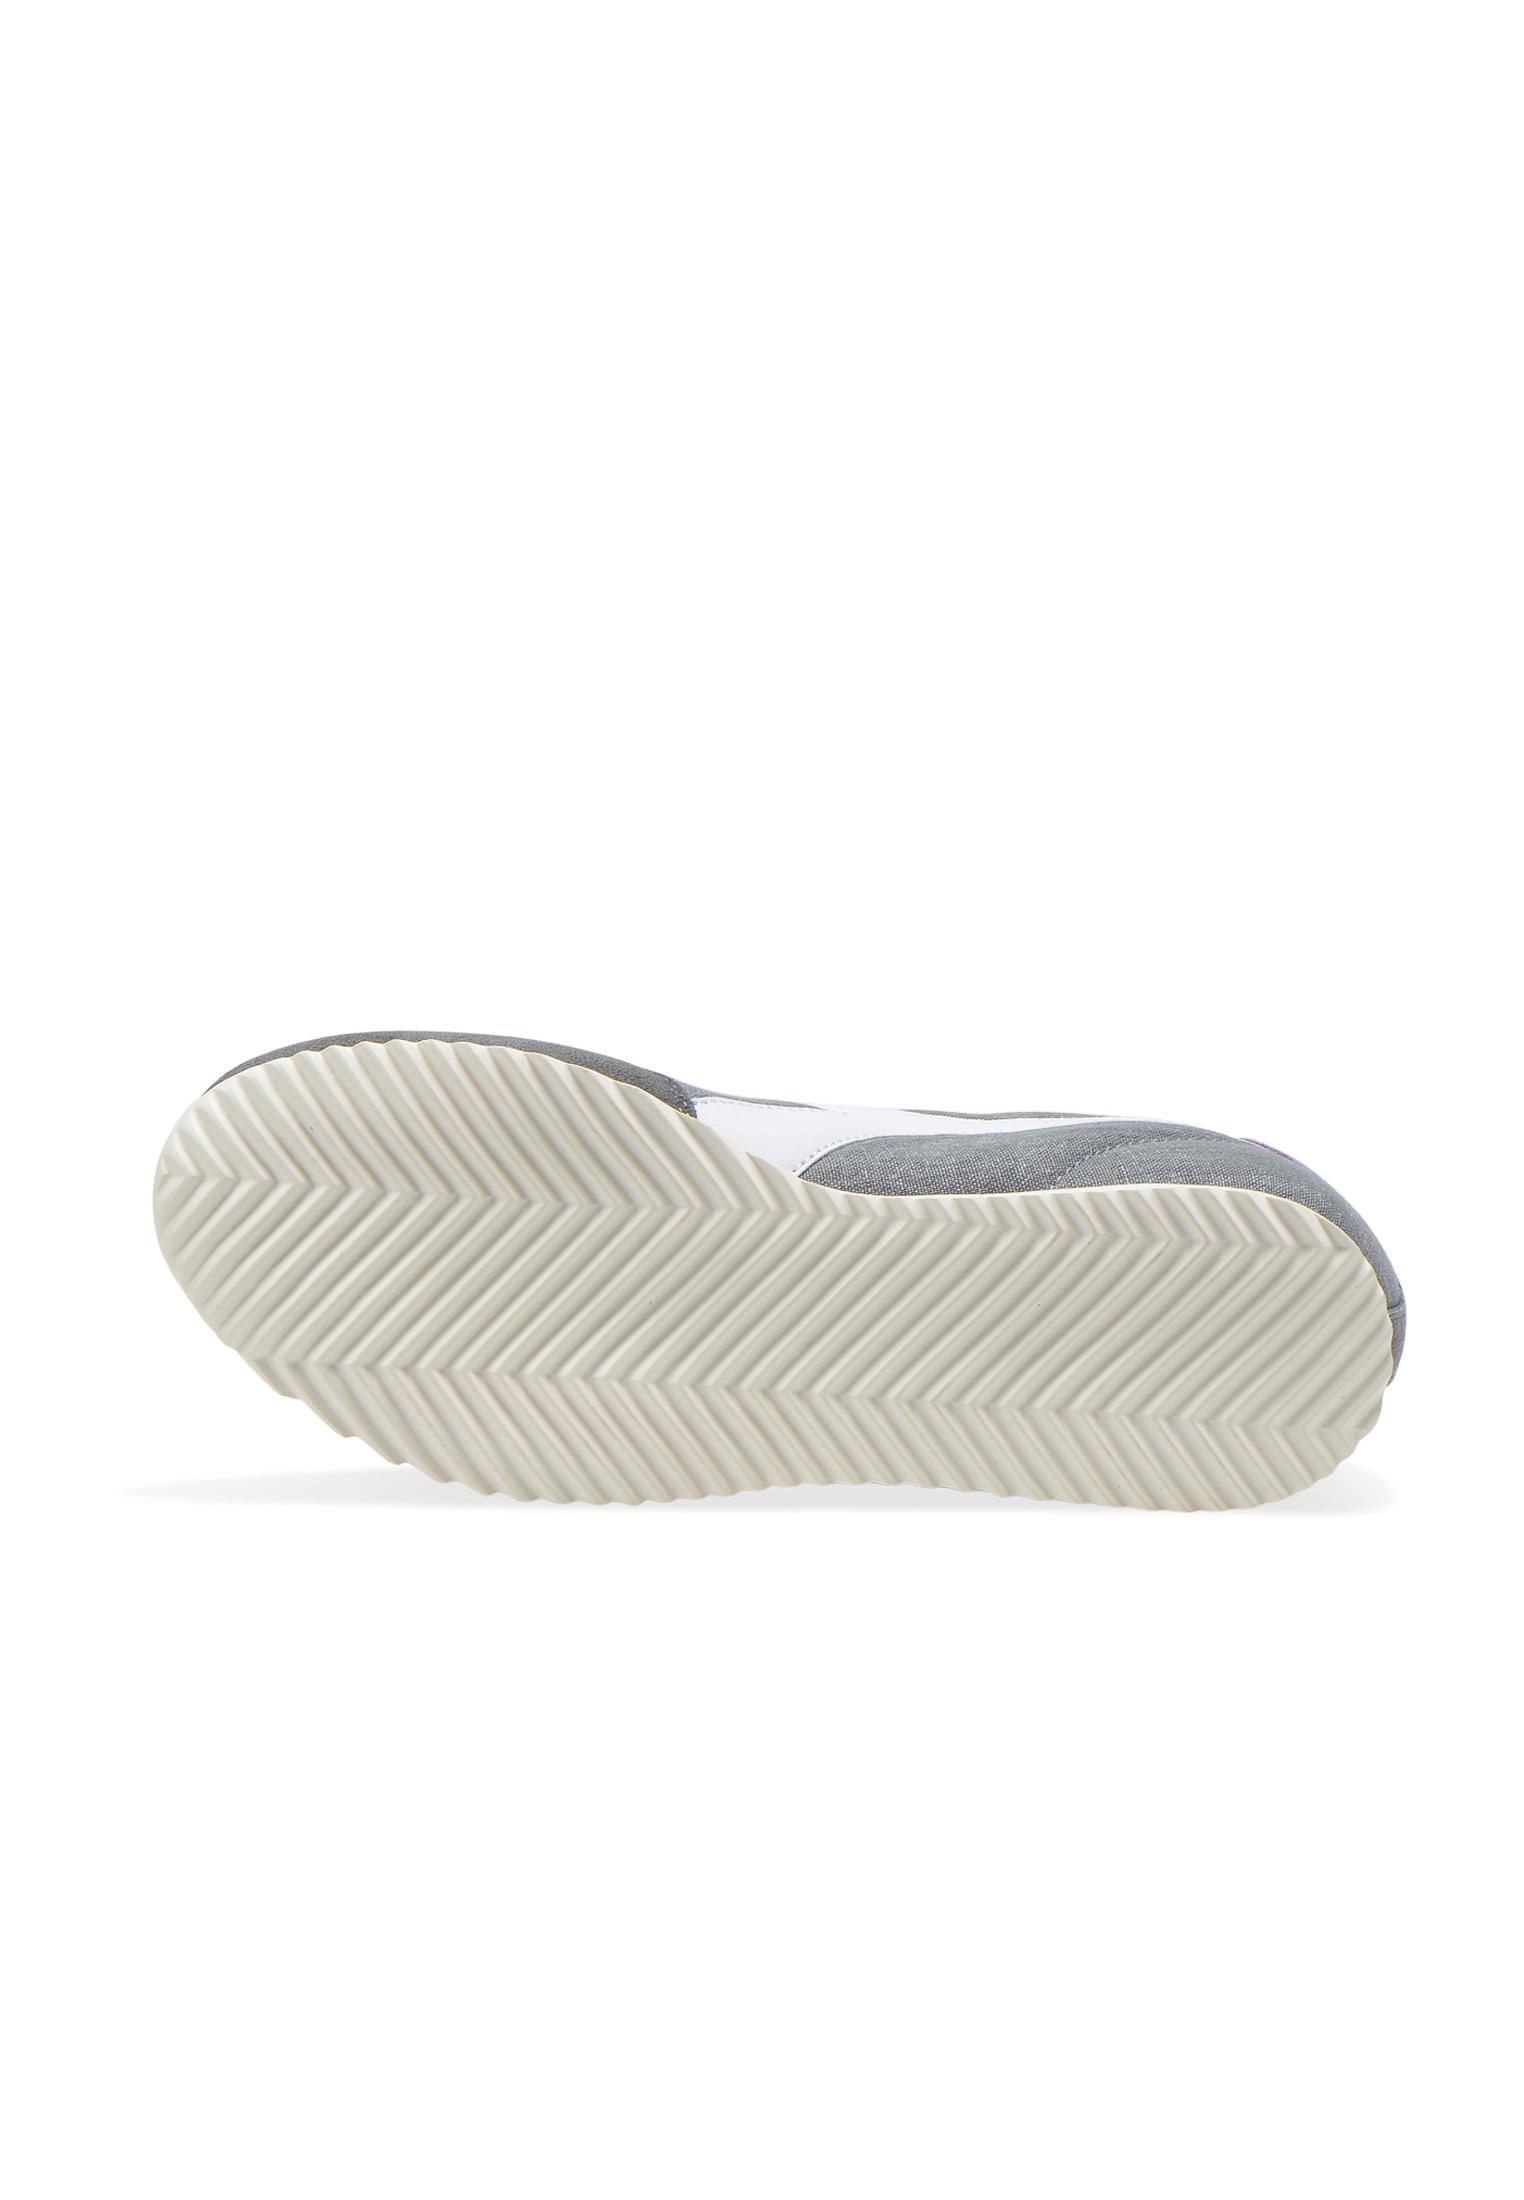 Scarpe-Diadora-Jog-Light-C-Sneakers-sportive-uomo-donna-vari-colori-e-taglie miniatura 82